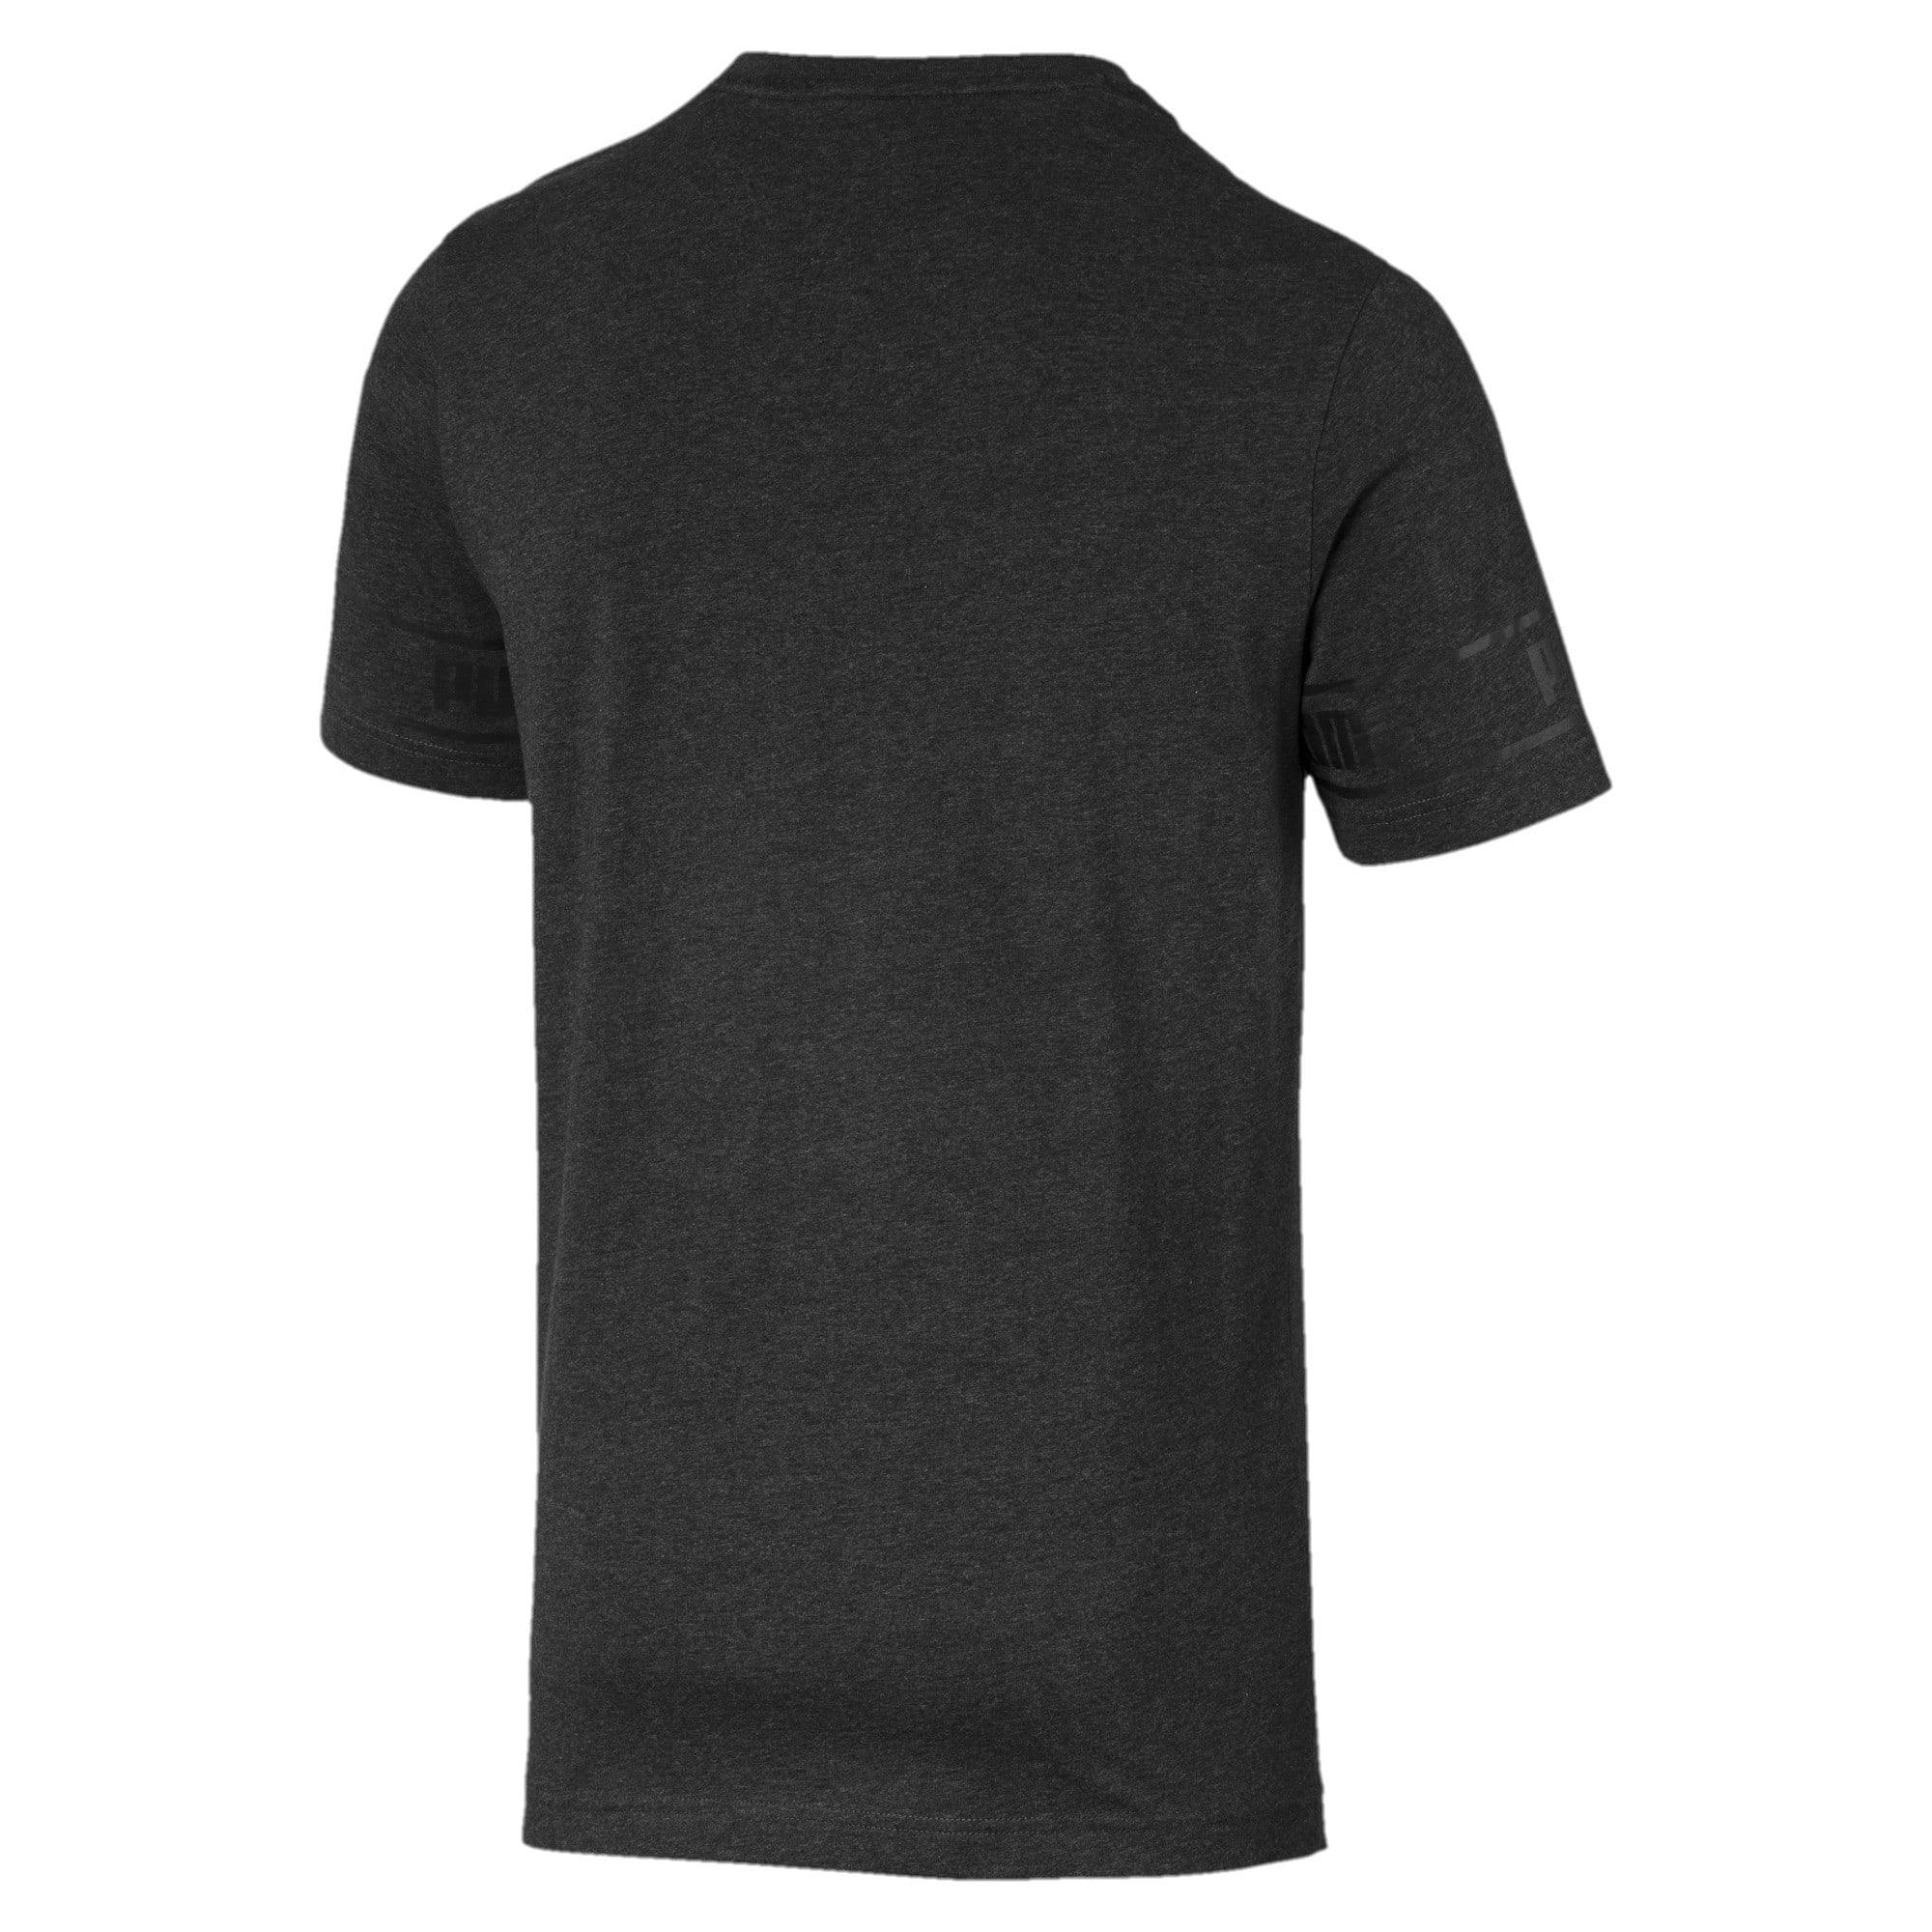 Miniaturka 5 Męska koszulka Amplified, Dark Gray Heather, średnie